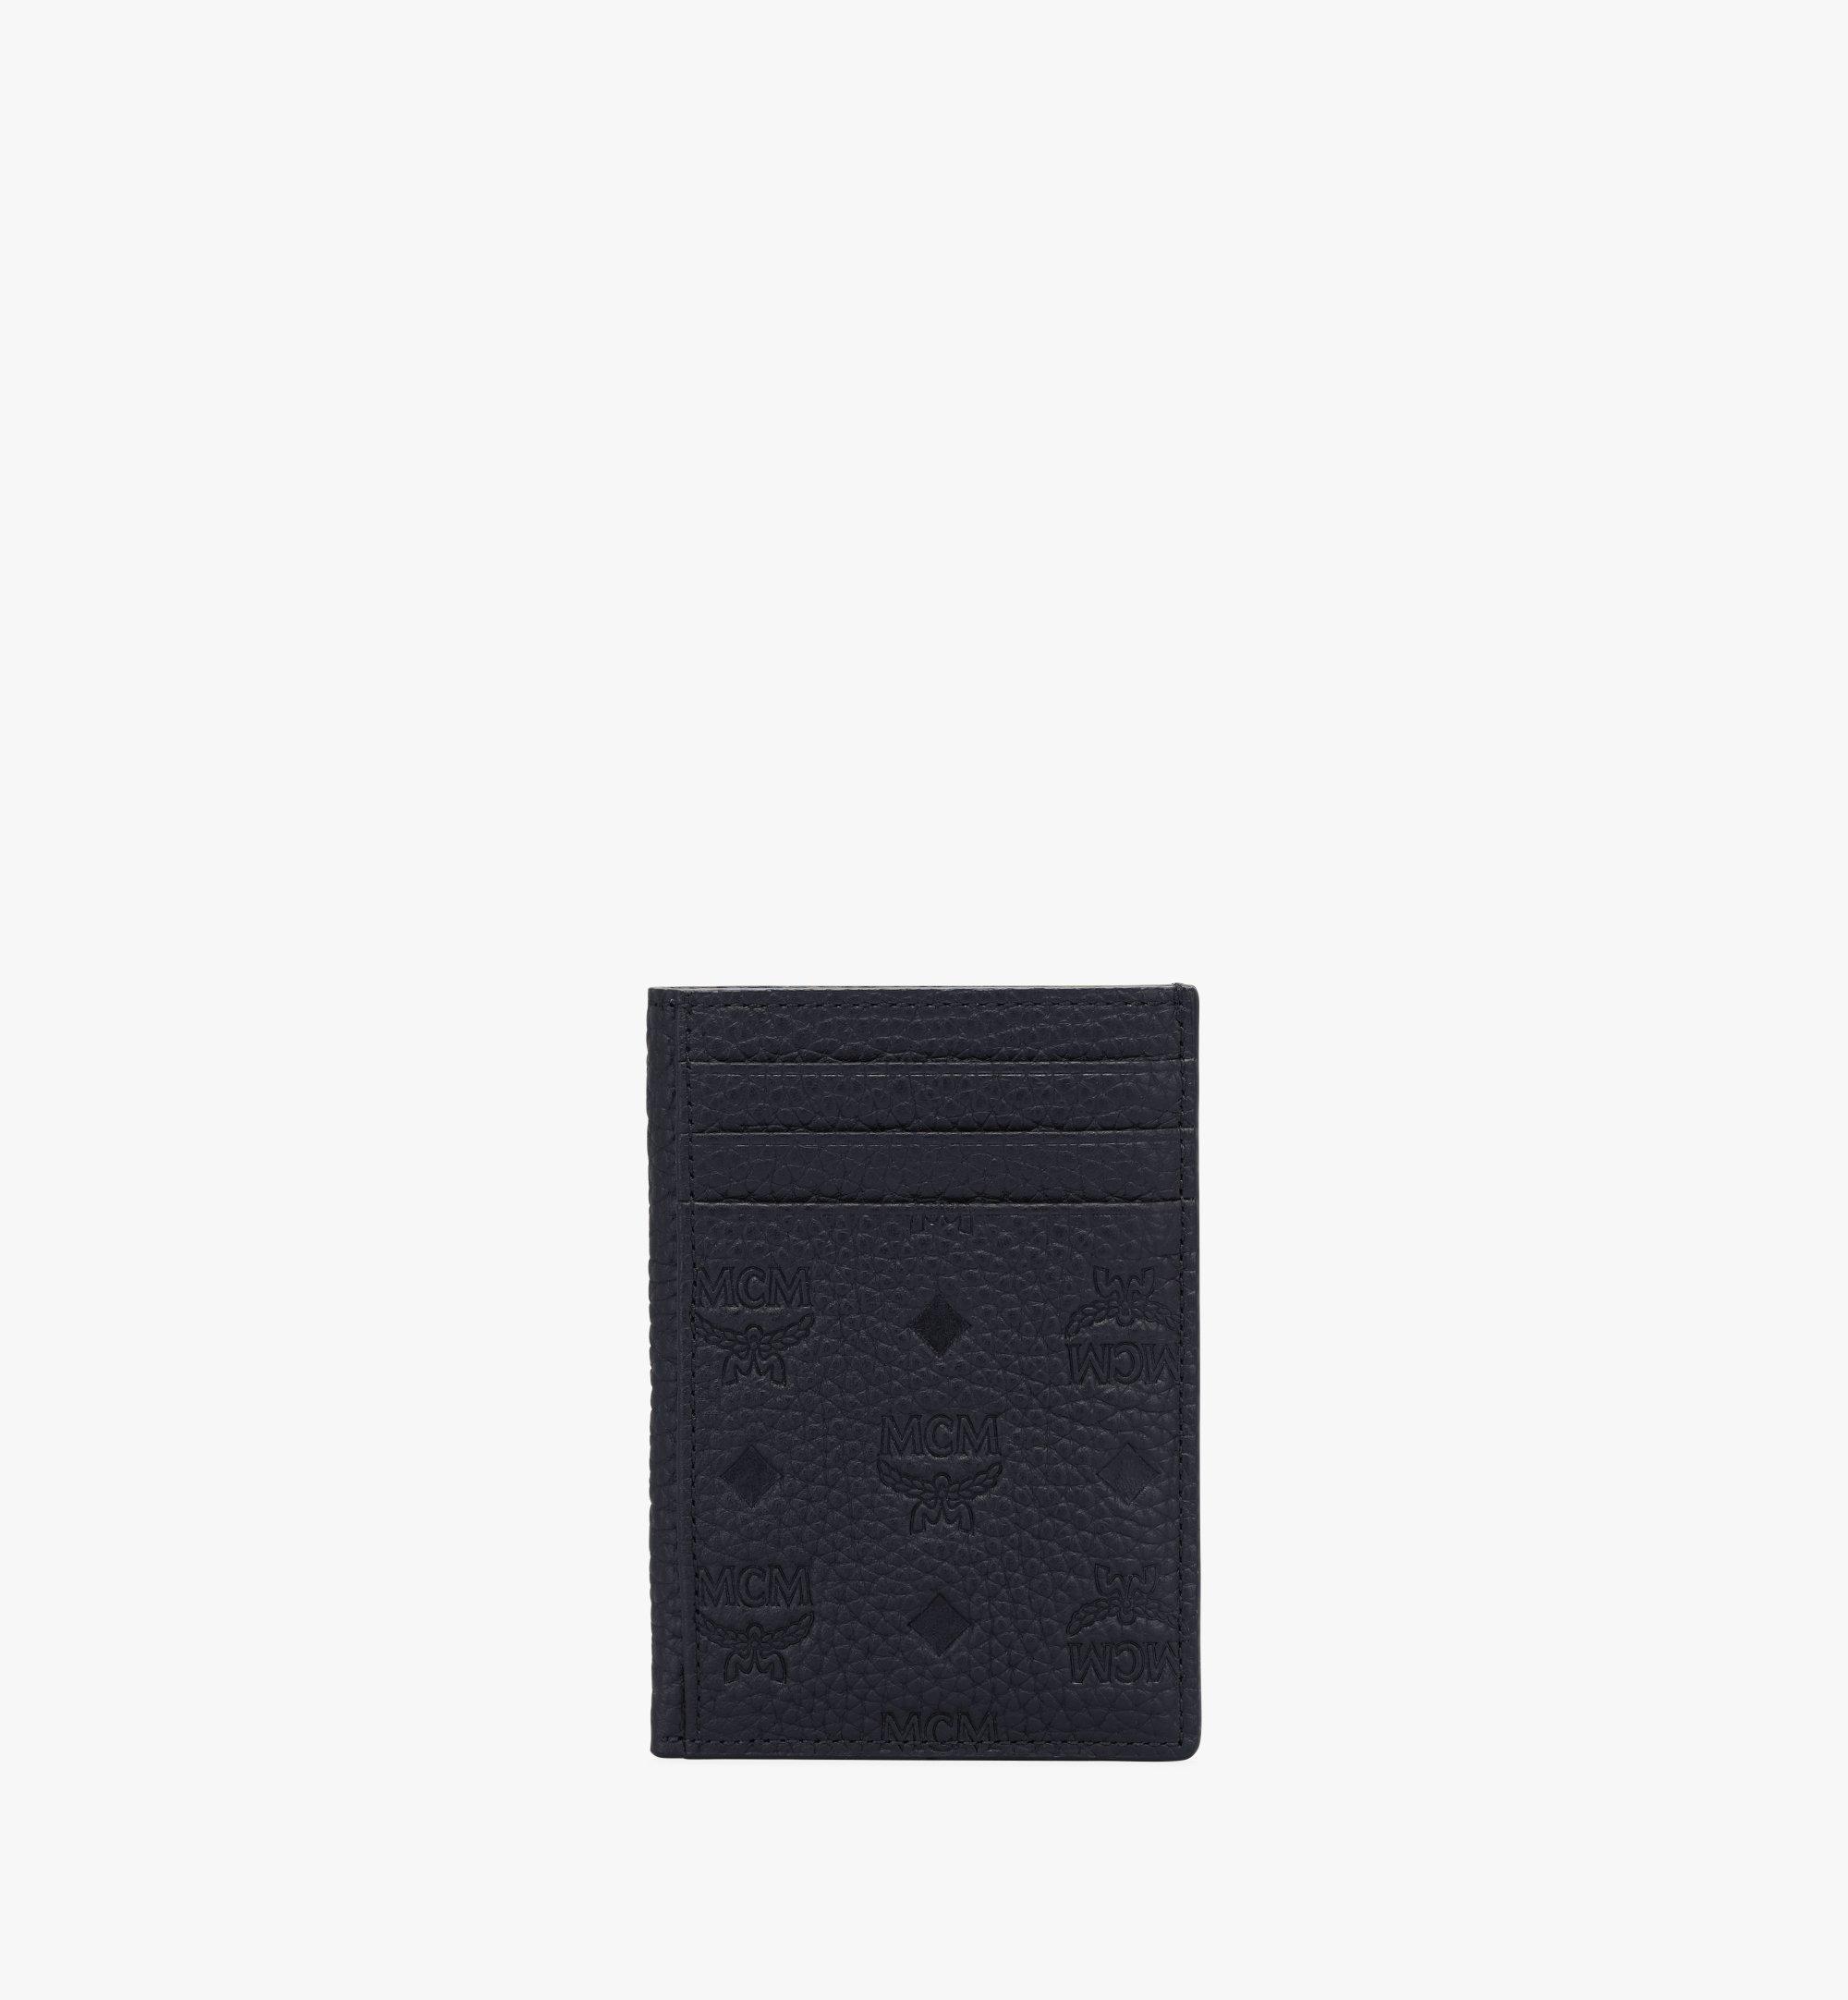 MCM Tivitat 縮寫字母圖案皮革 N/S 卡片夾 Black MXAAABT01BK001 更多視圖 1